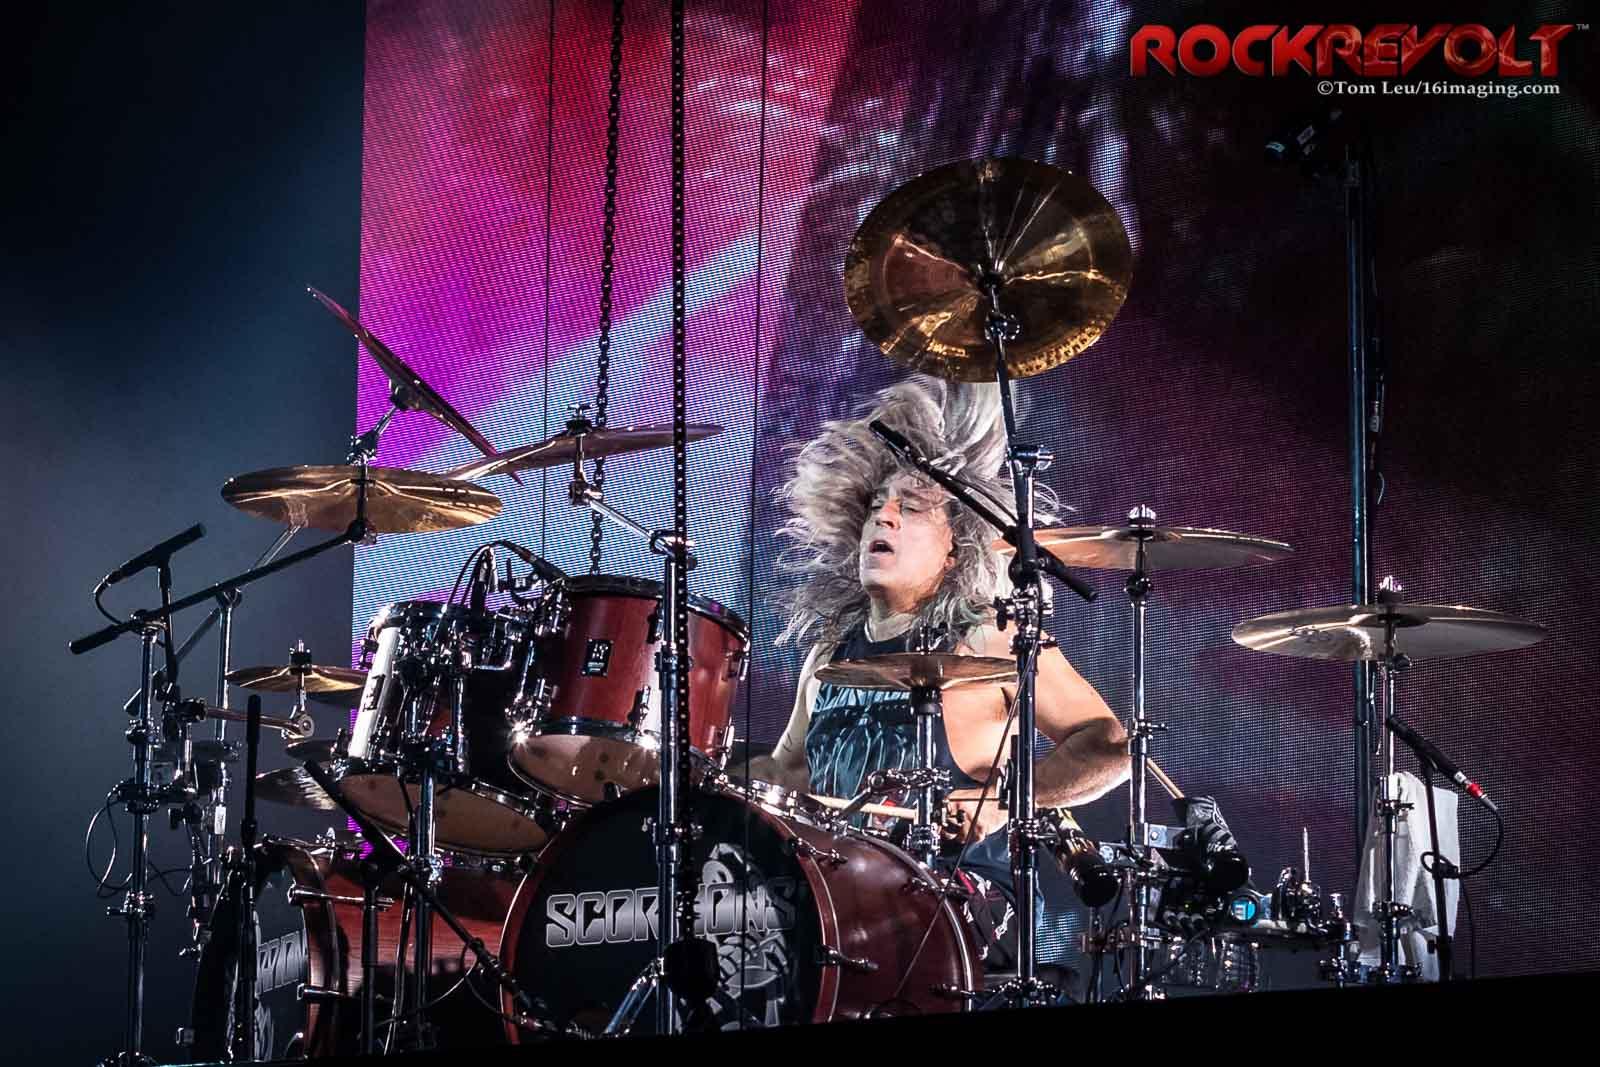 2016_Scorpions_RockRevolt20